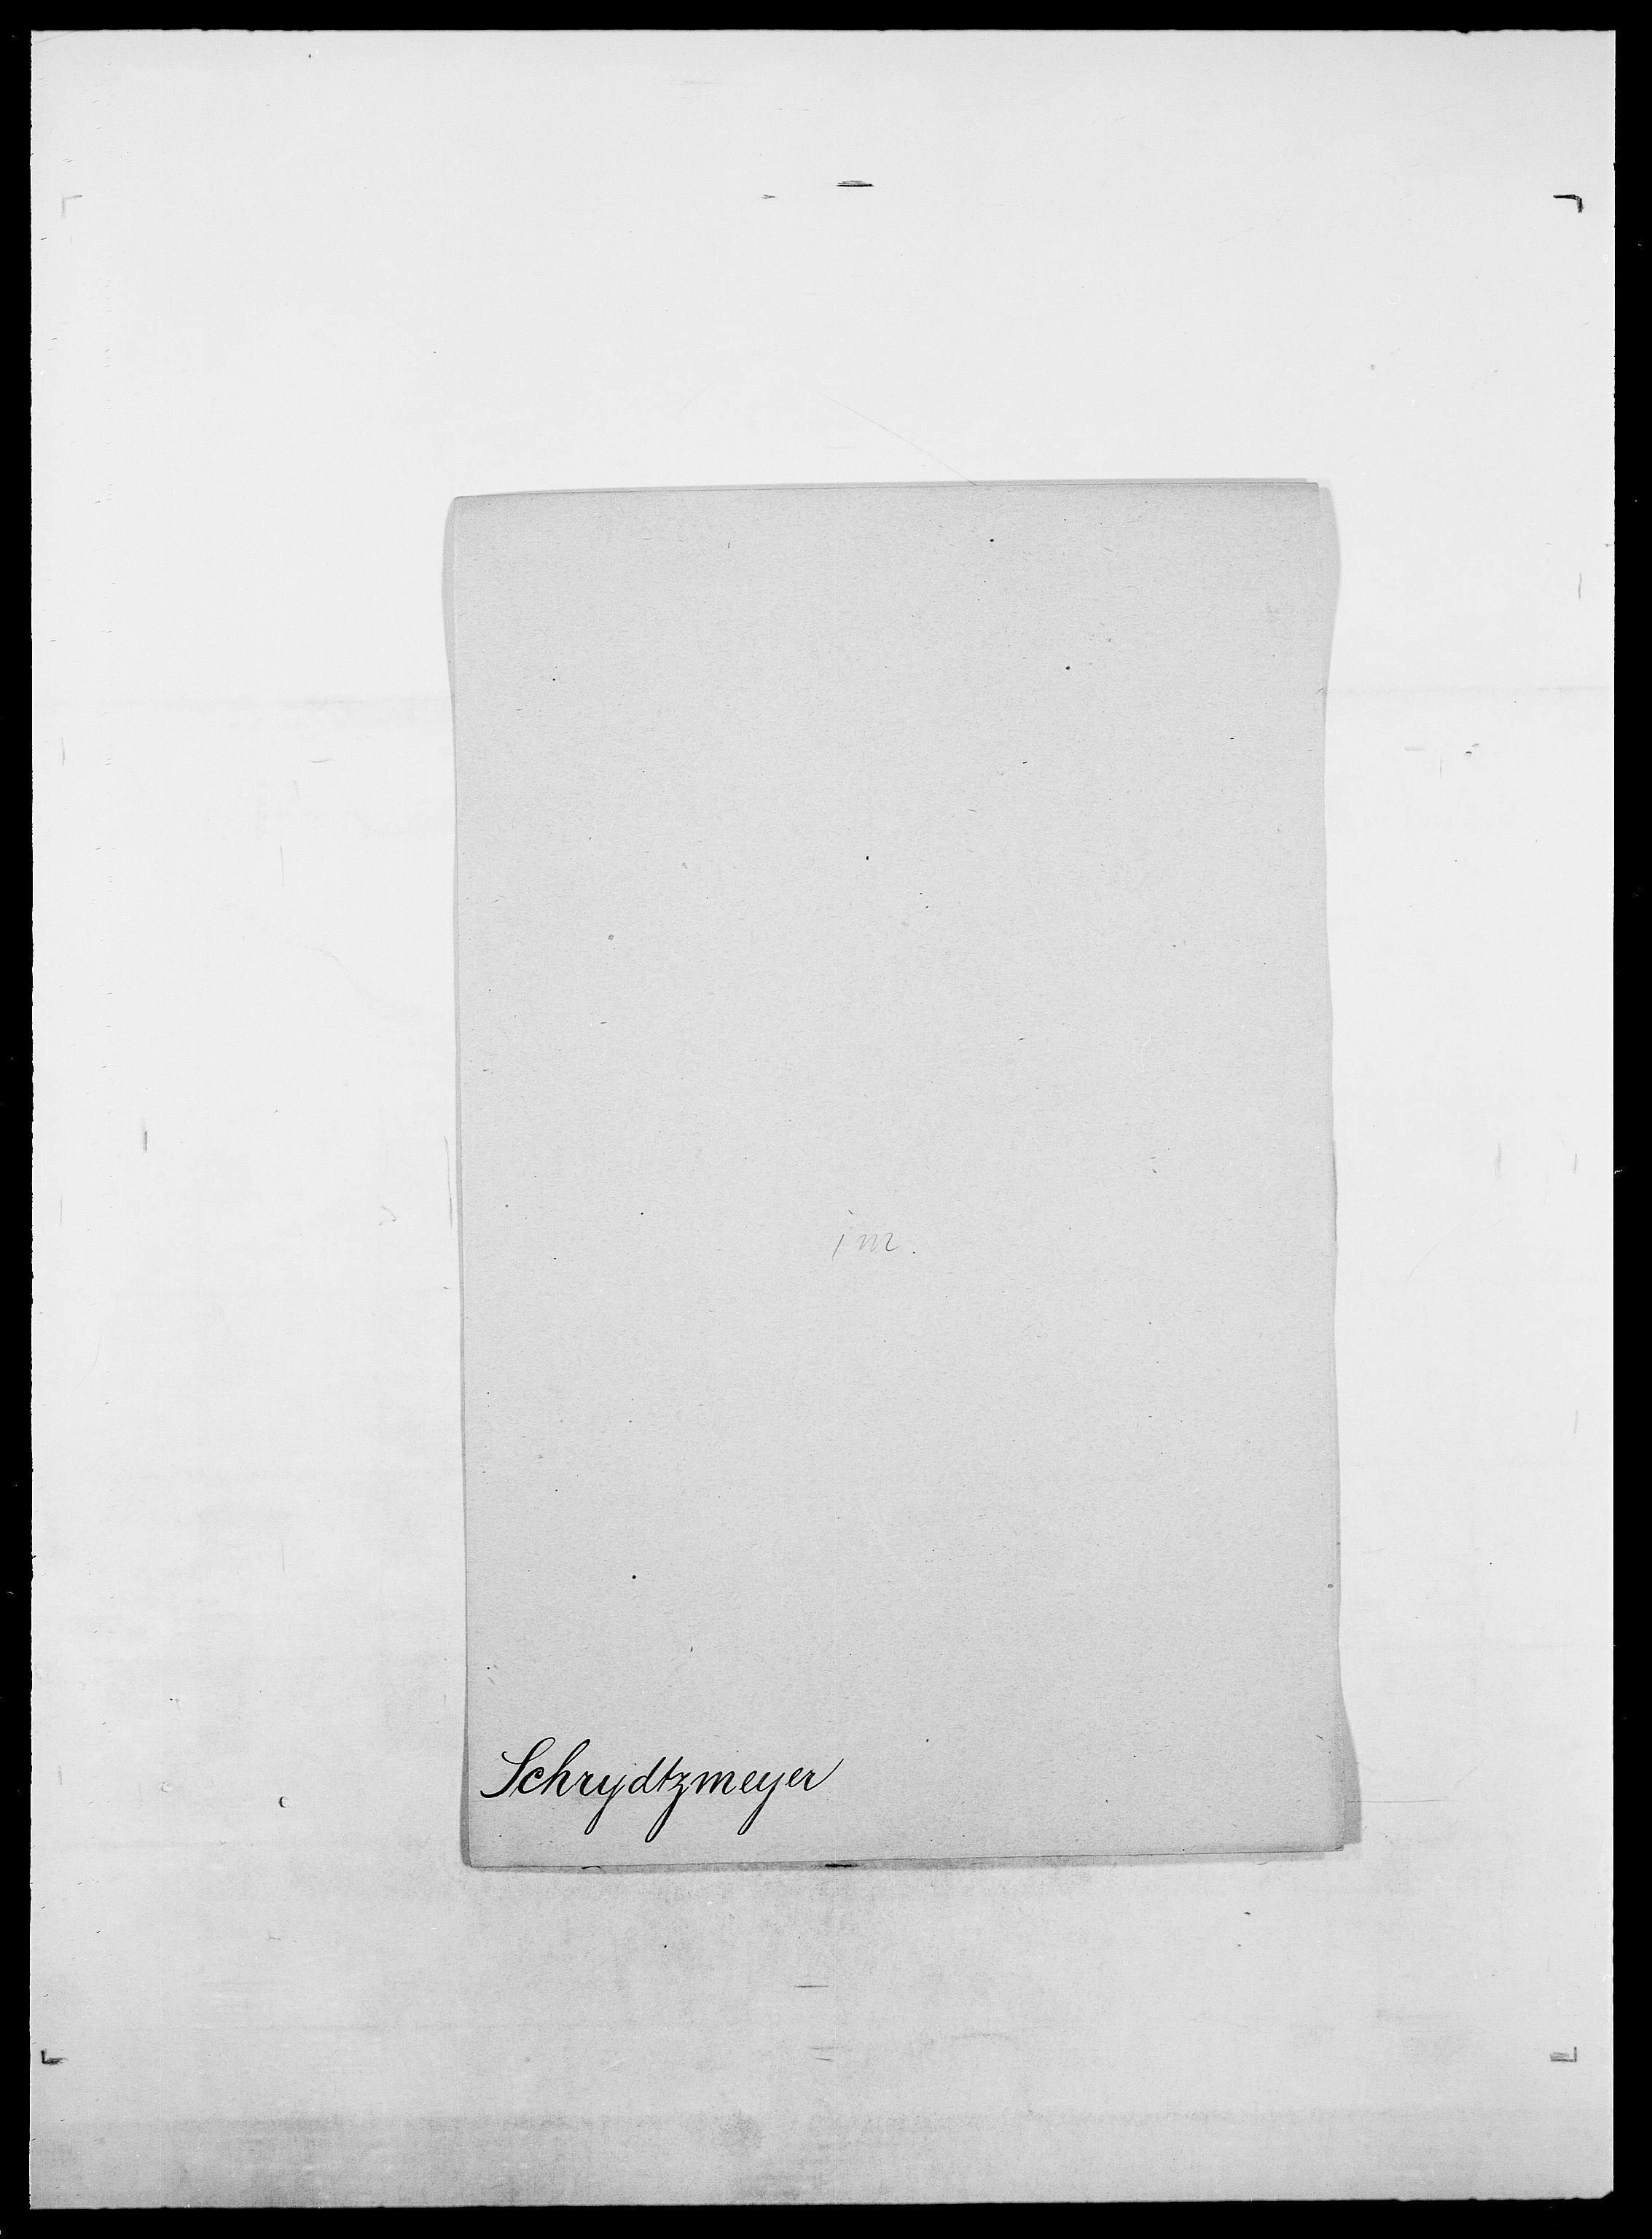 SAO, Delgobe, Charles Antoine - samling, D/Da/L0035: Schnabel - sjetman, s. 184